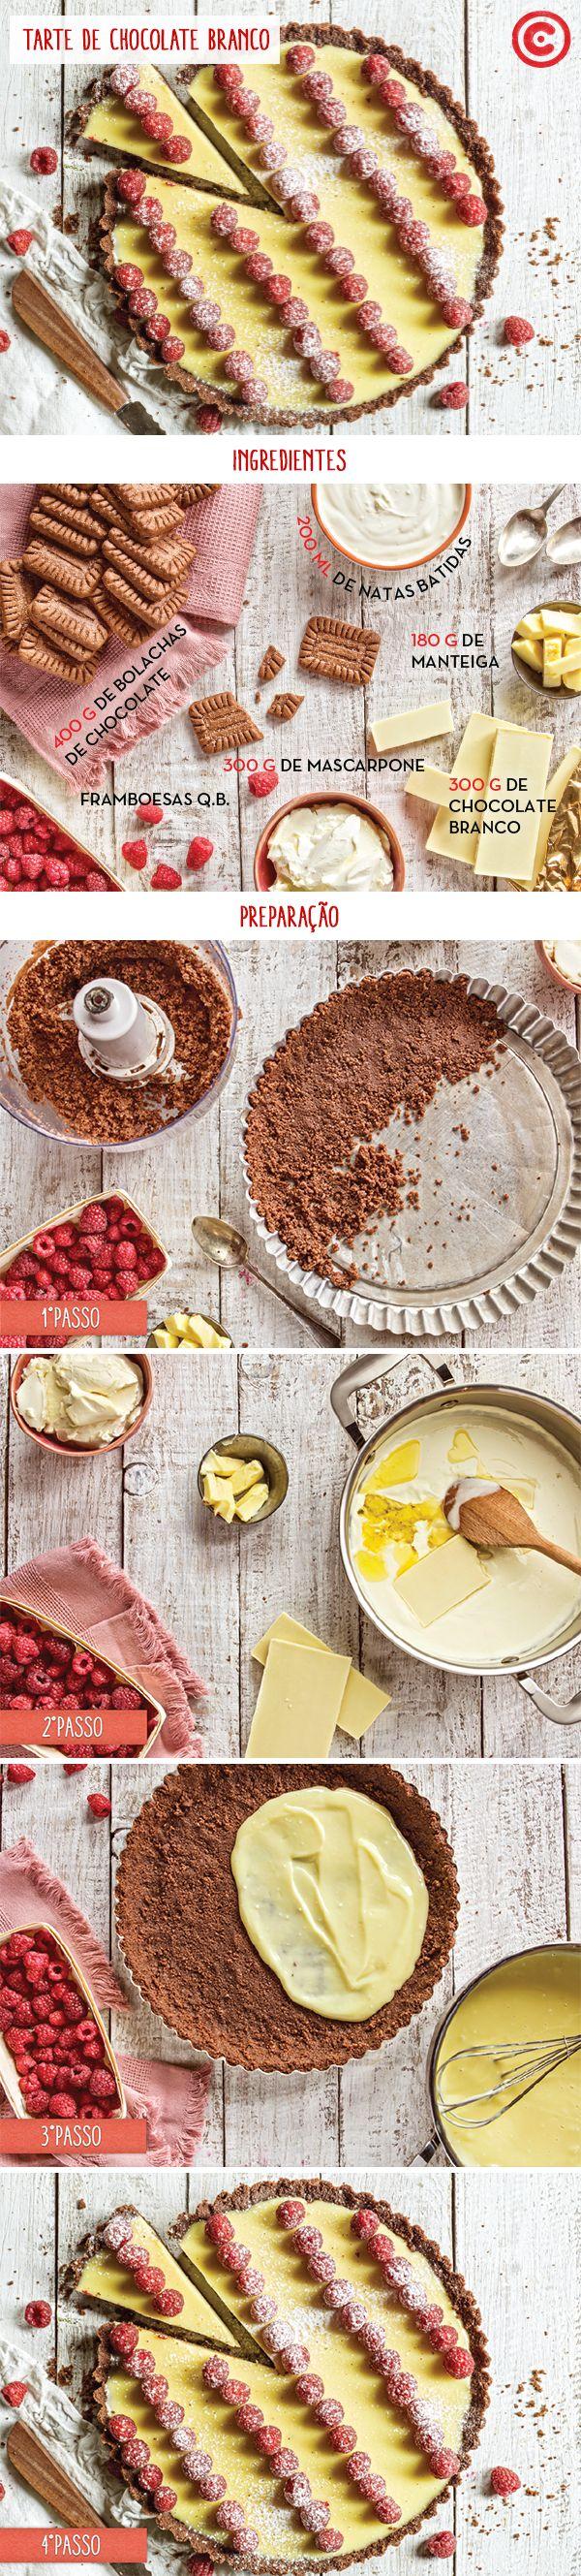 Tarte de chocolate branco | Continente Magazine - setembro 2016